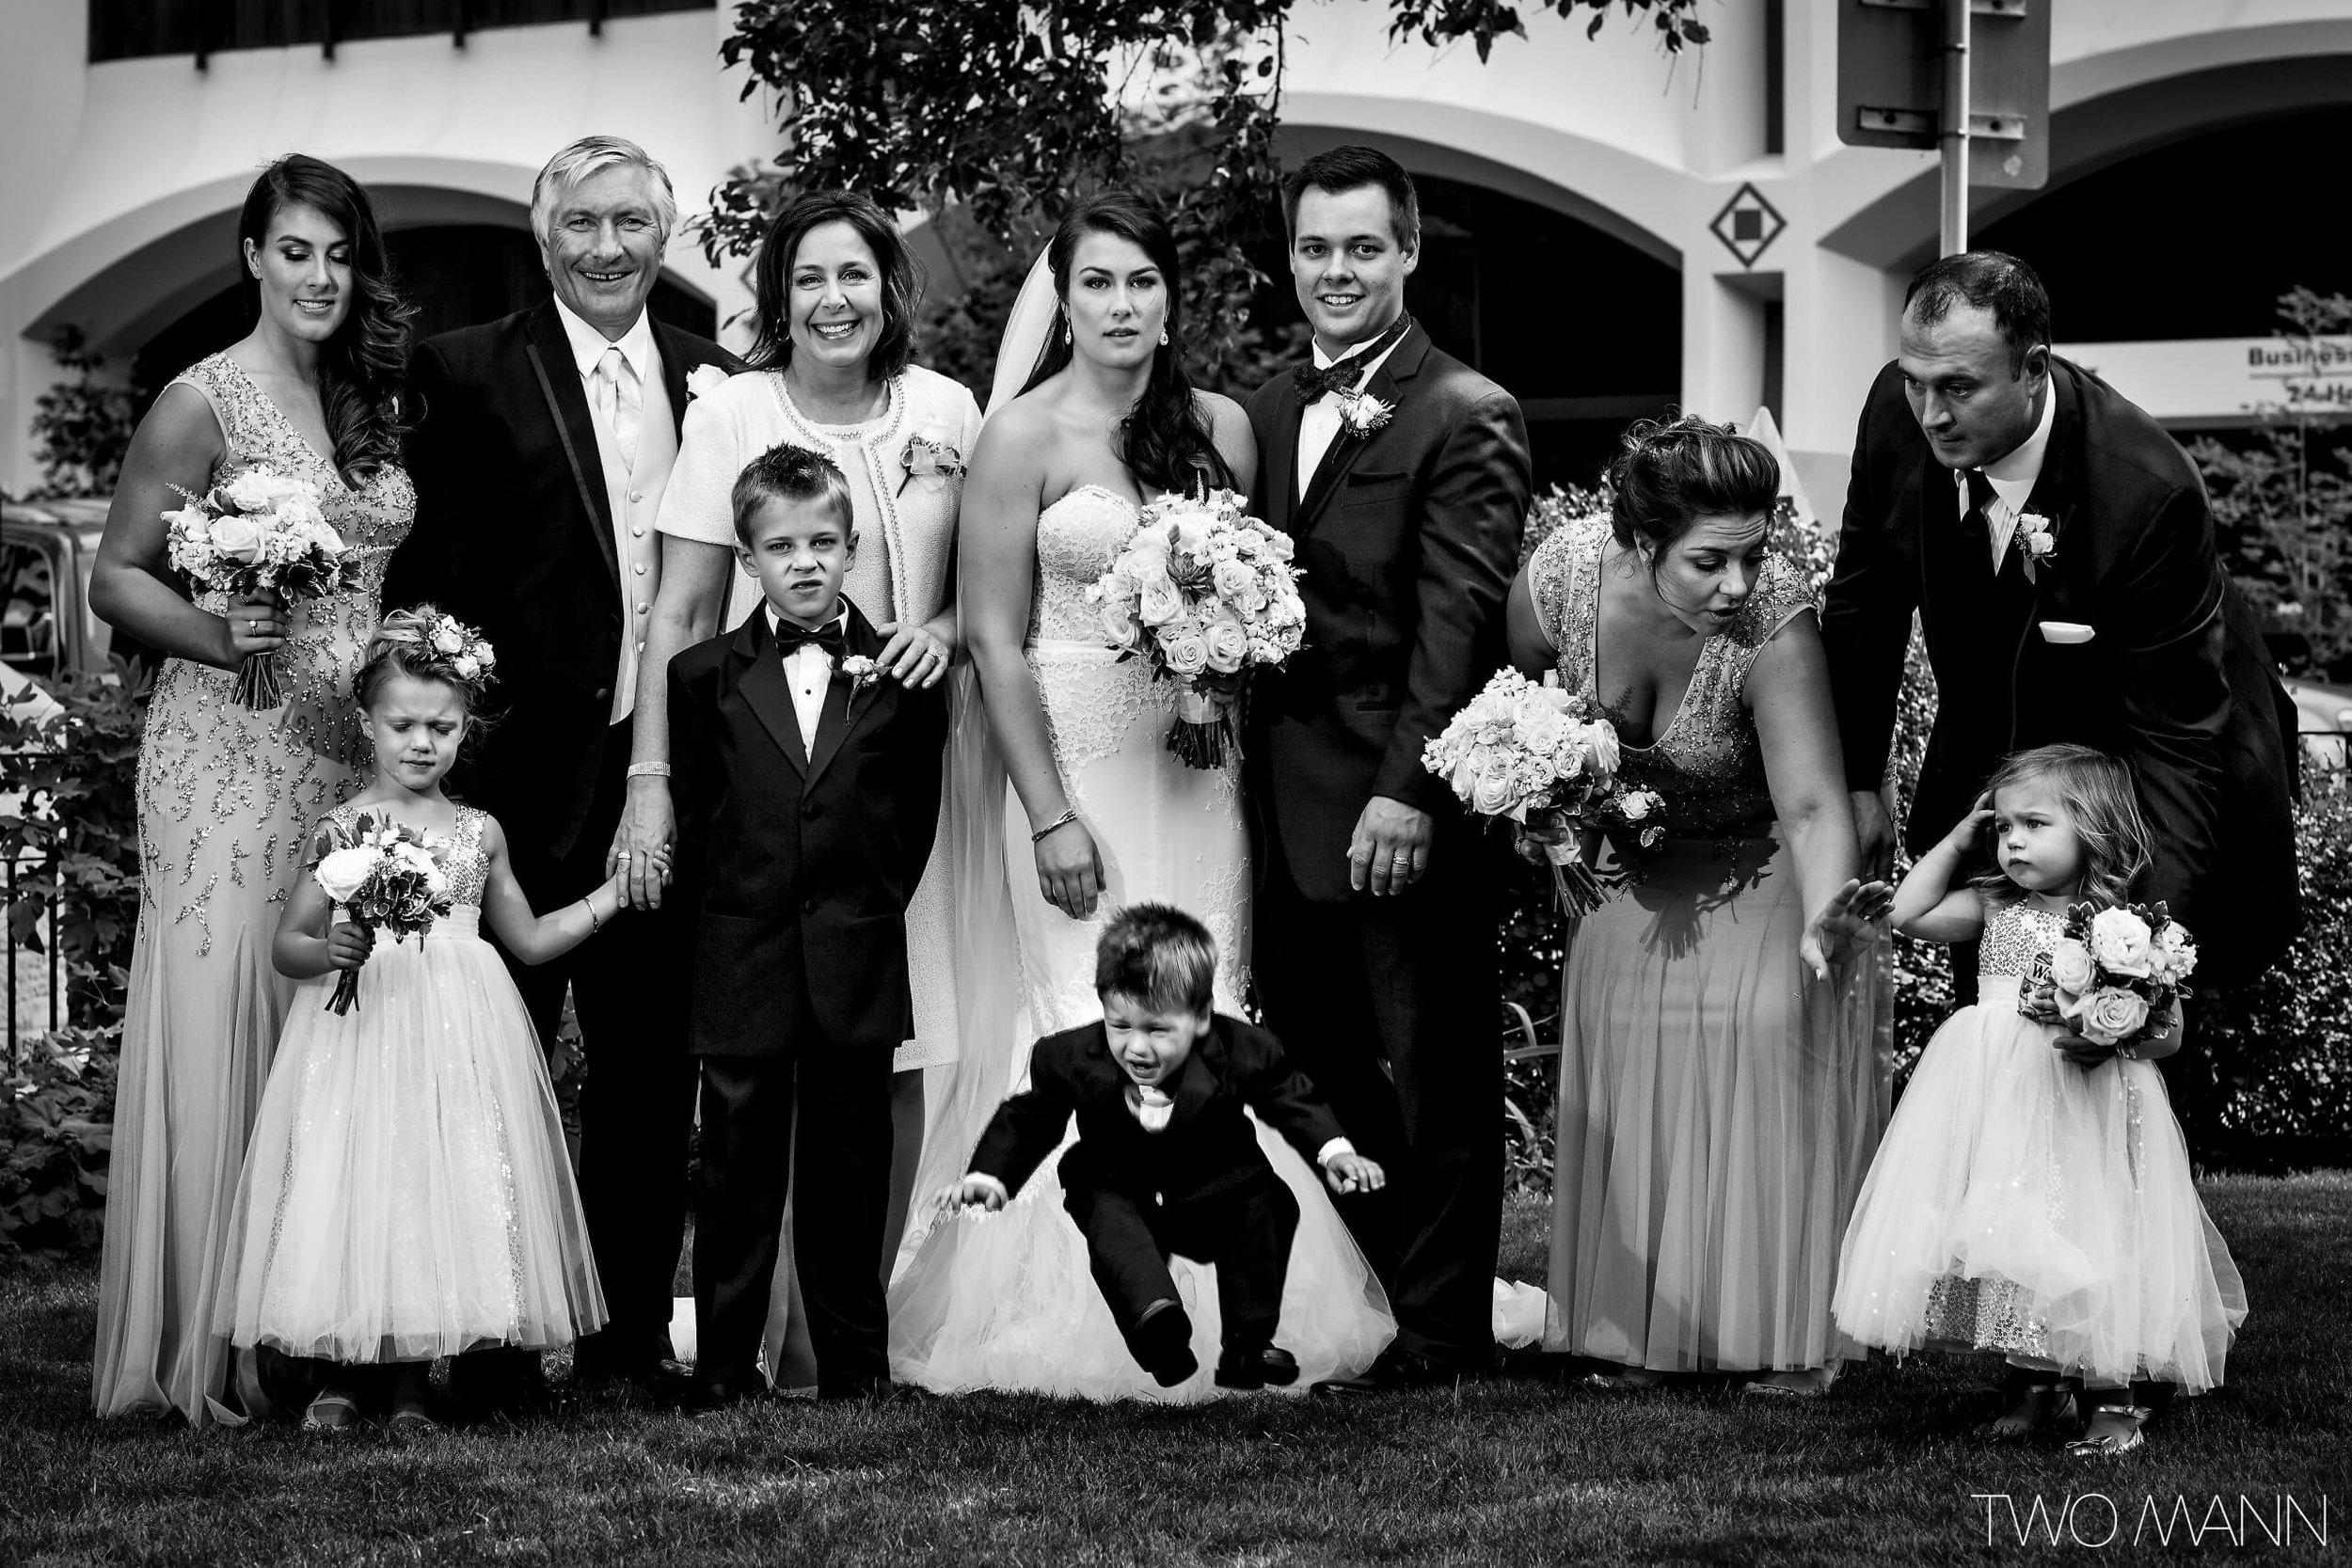 Two-Mann-Studios-Worlds-Best-Wedding-Photography-Best-of-2016-077-2560x1707.jpg